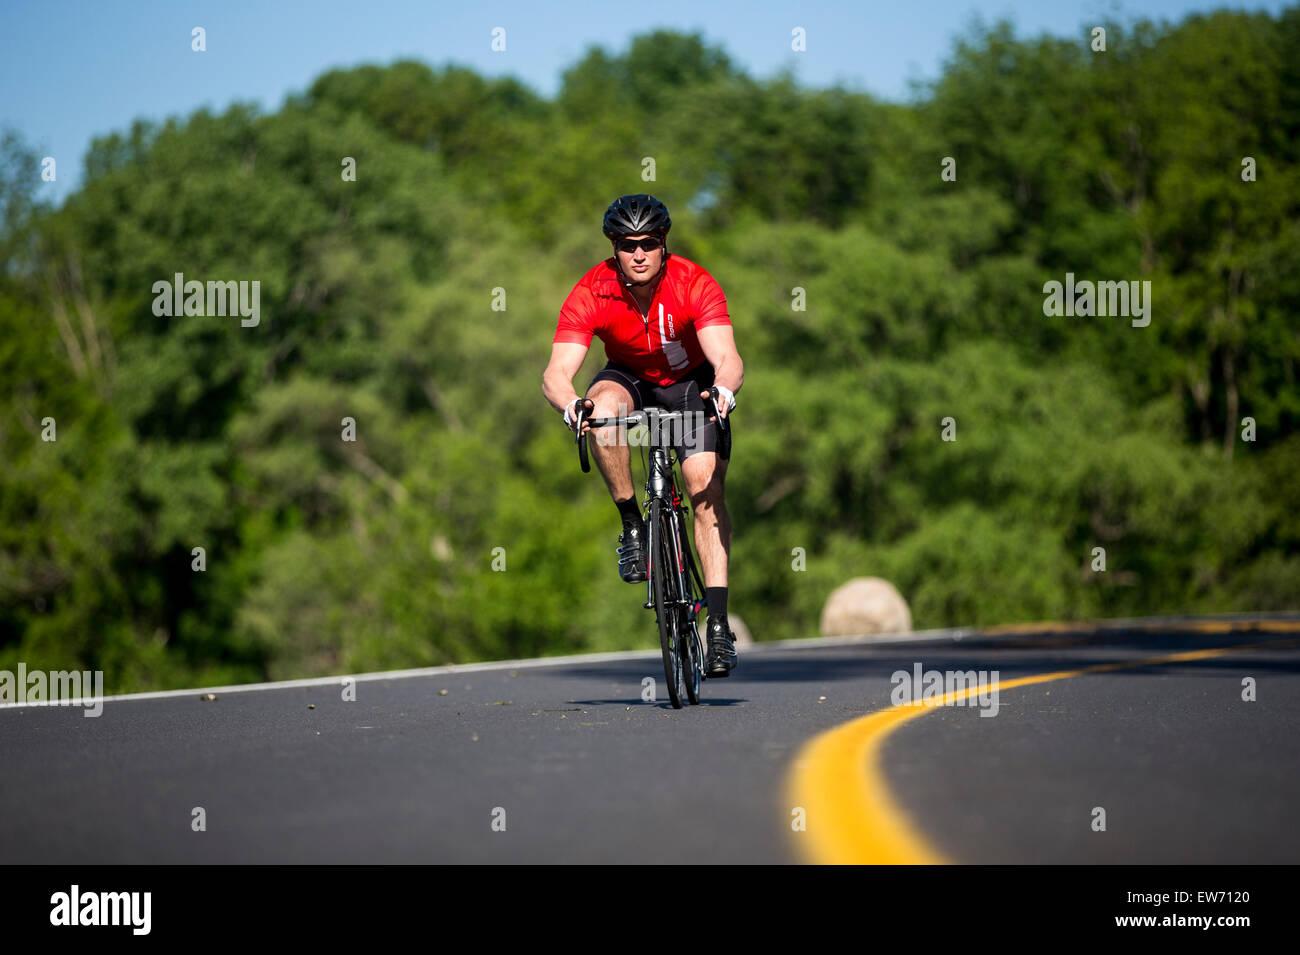 Man riding a road bike on a paved roadway Stock Photo: 84362376 - Alamy